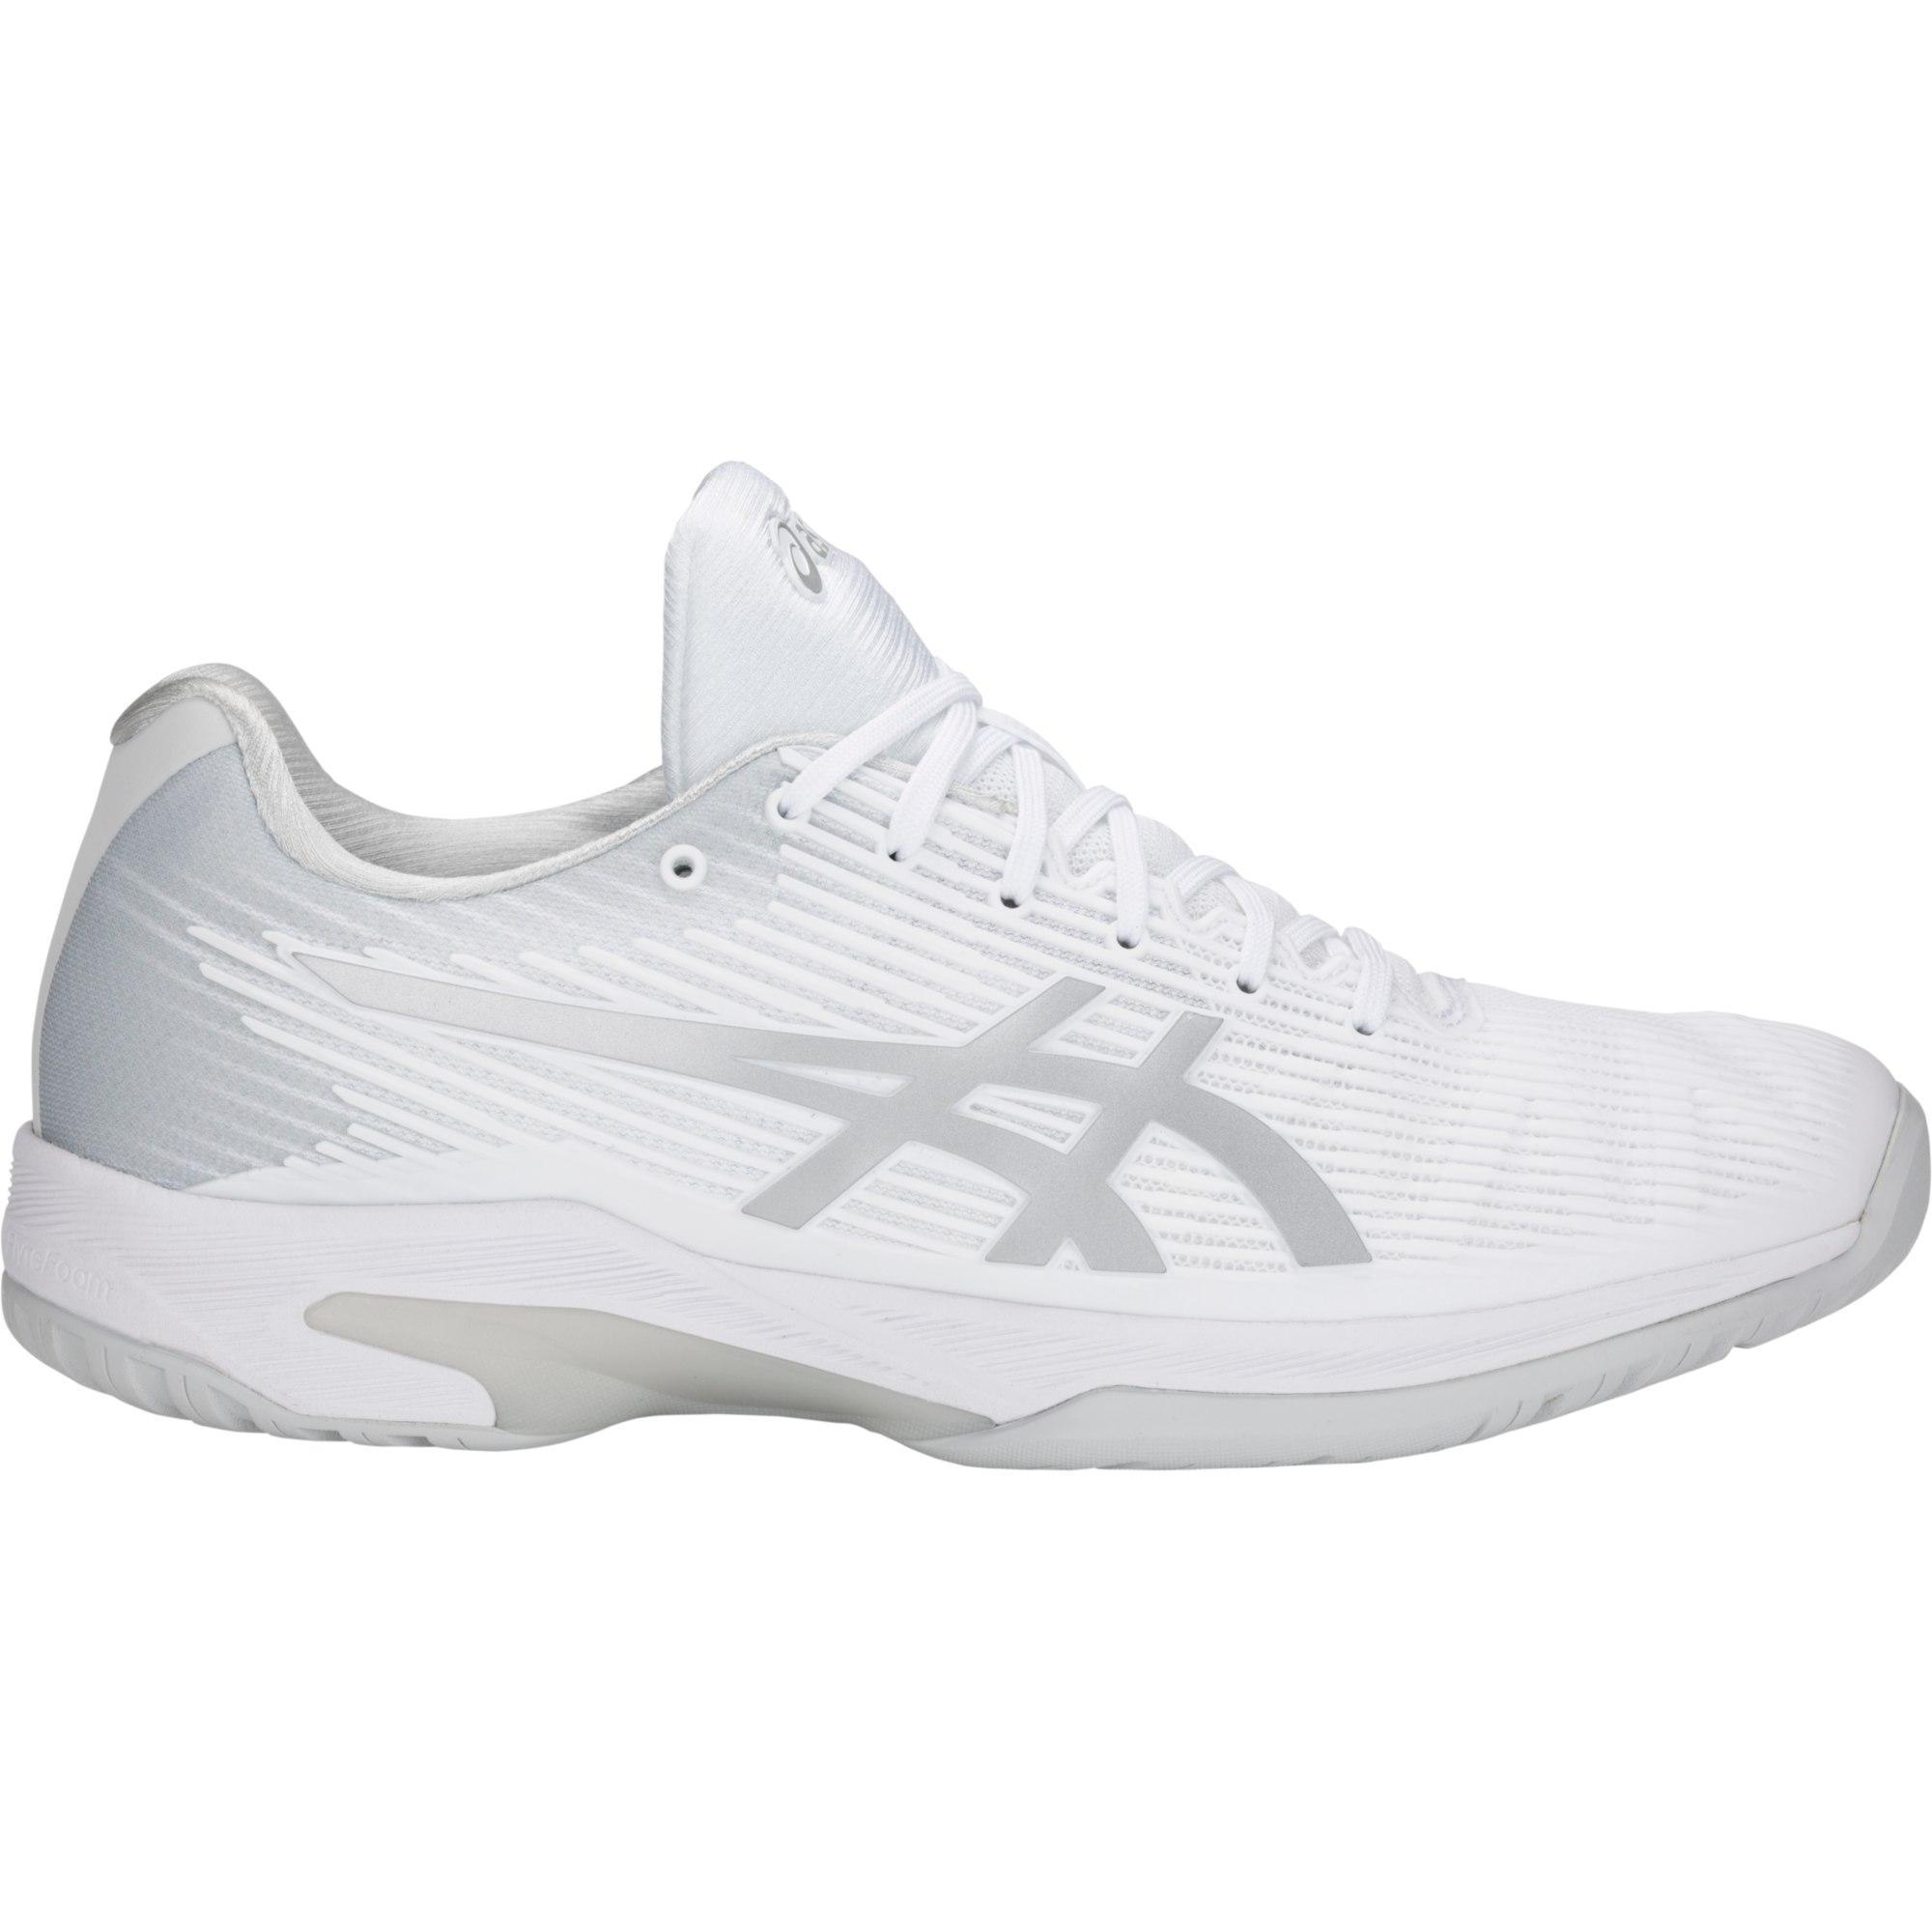 Asics Hommes Asics Chaussures de tennis GEL Solution Argent Speed FF Speed Blanc/ Argent d9cb366 - acornarboricultural.info